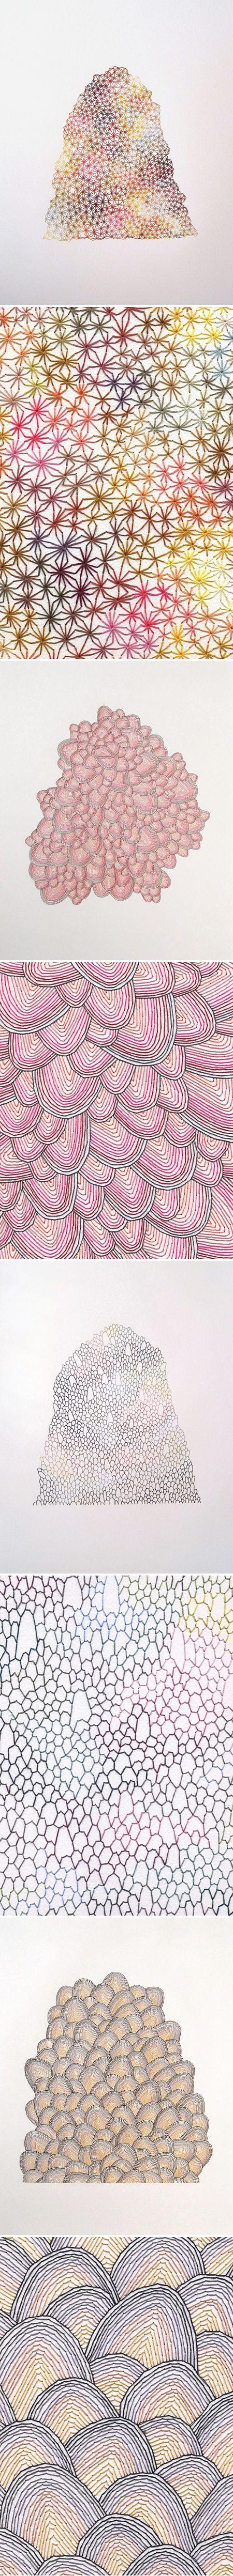 Emily Barletta's embroidered pattern art